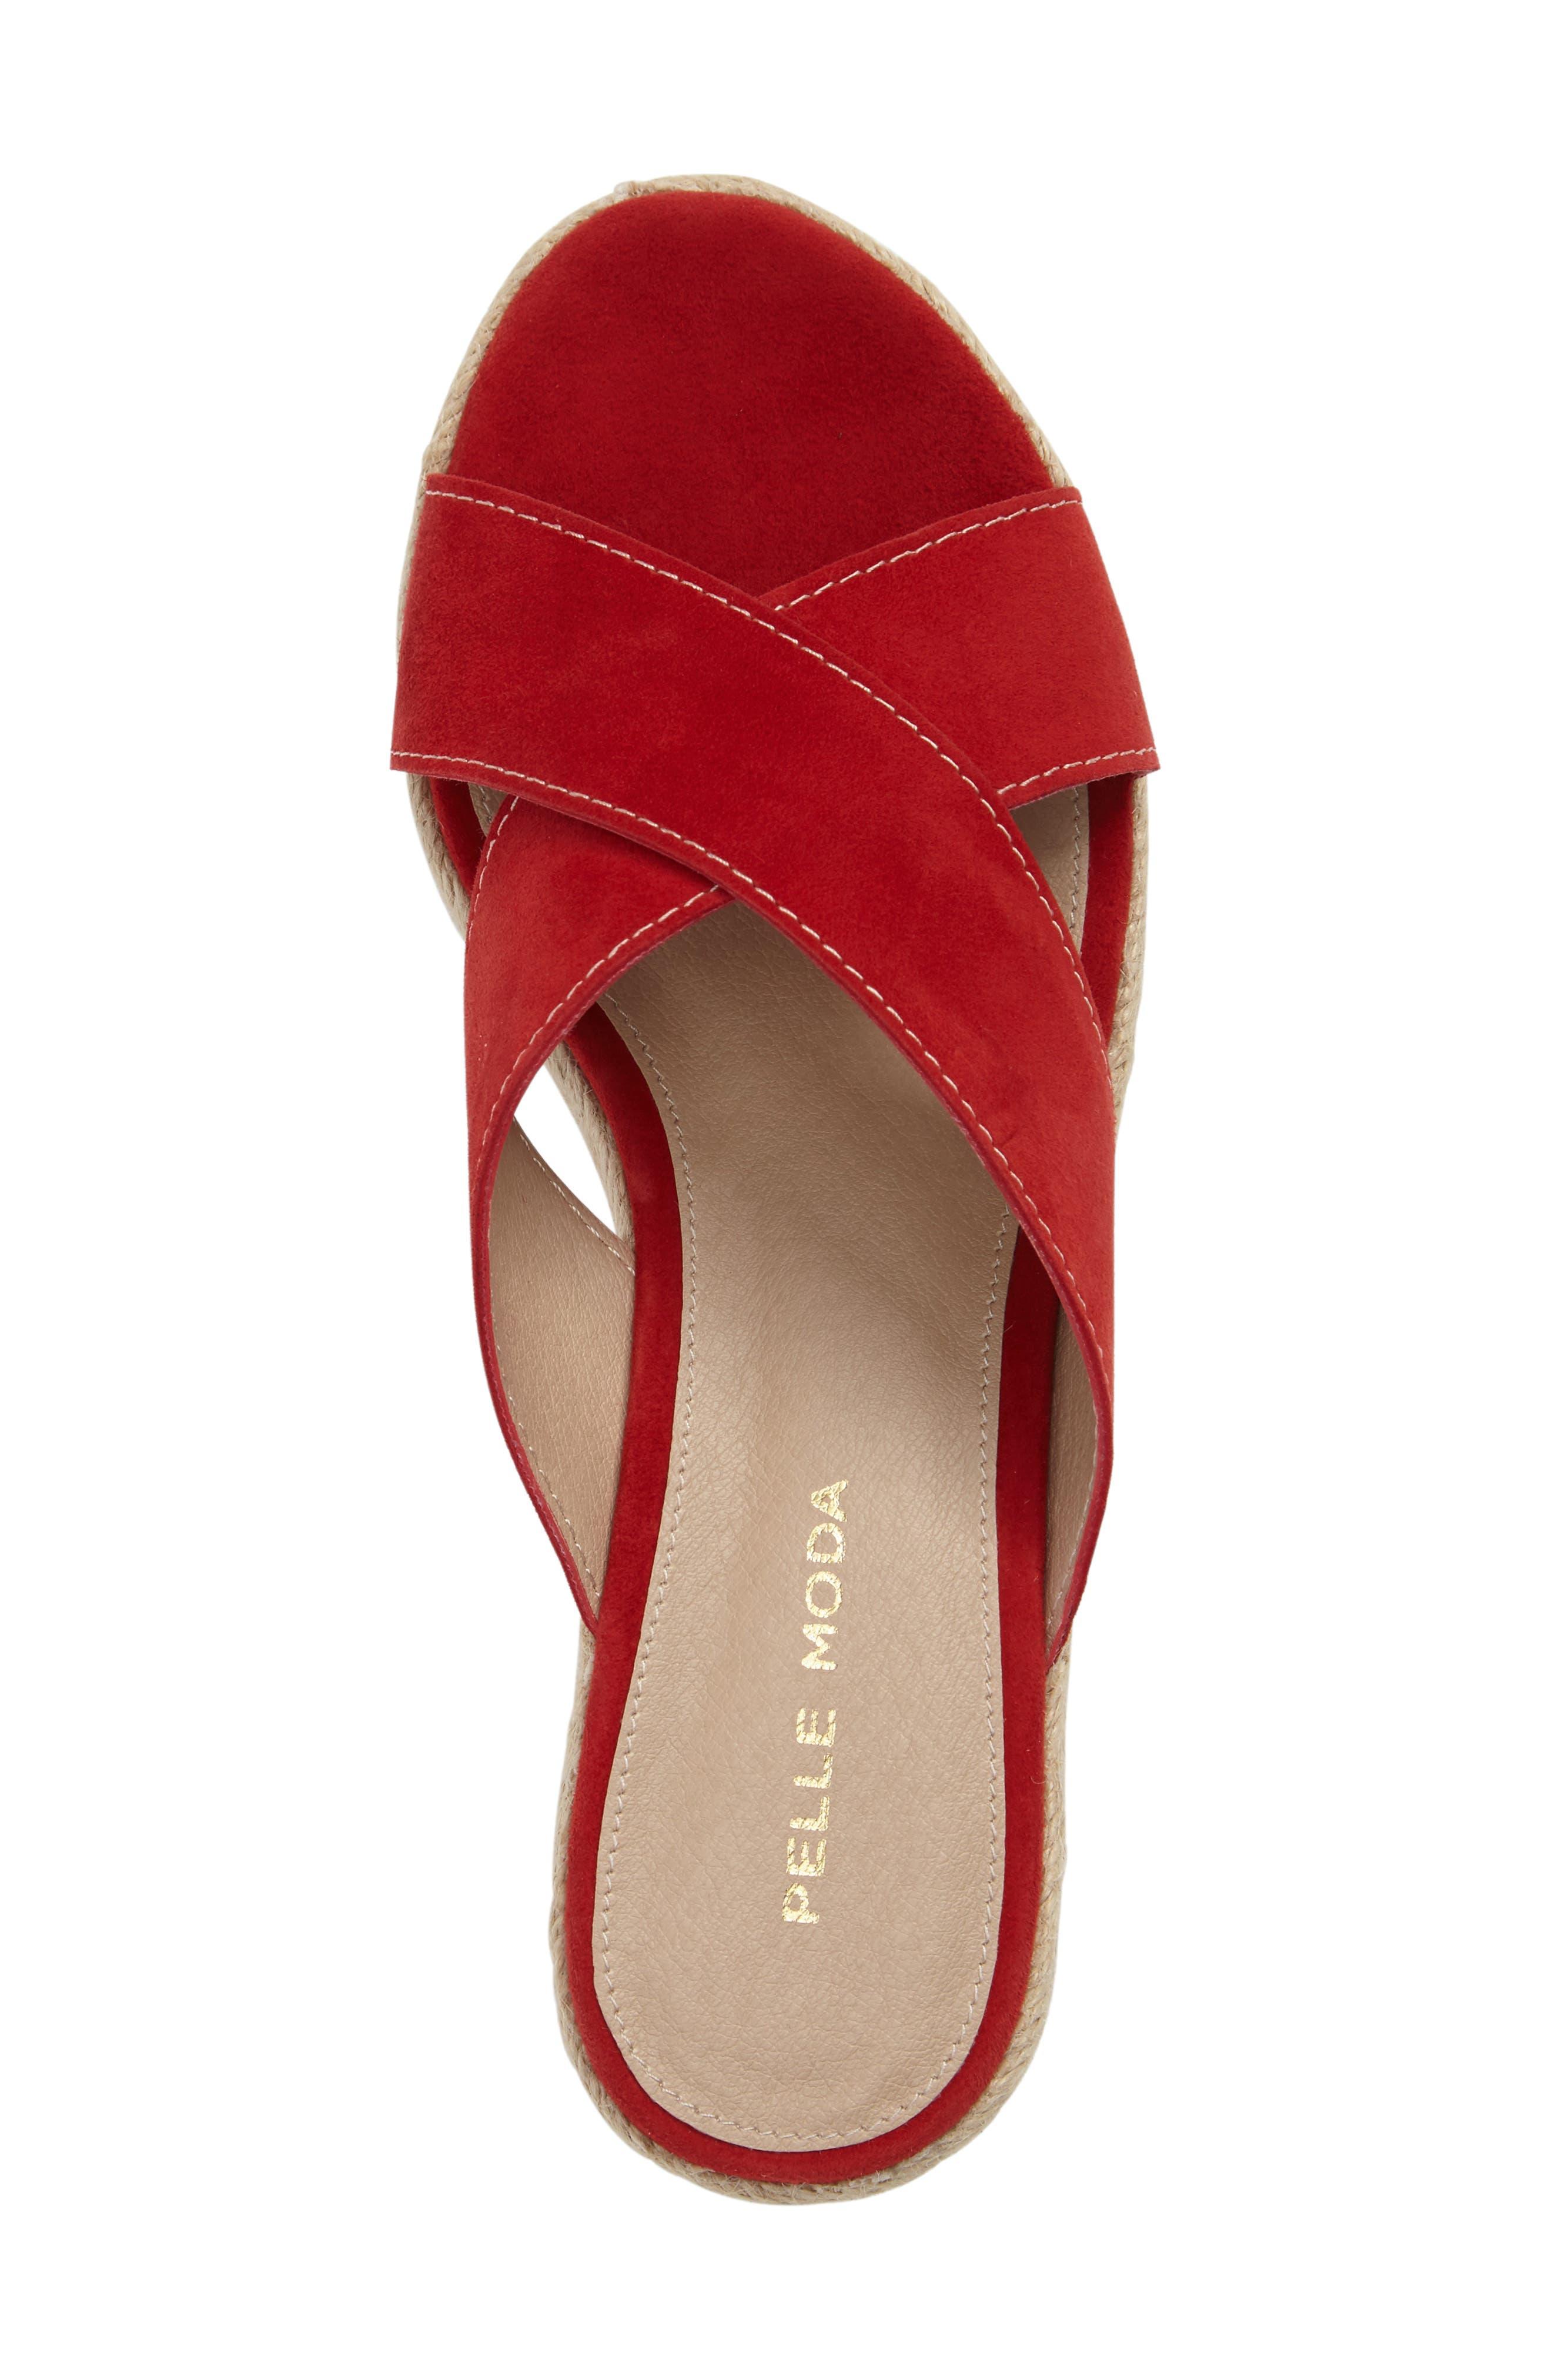 Harriet Platform Wedge Sandal,                             Alternate thumbnail 5, color,                             Lipstick Leather